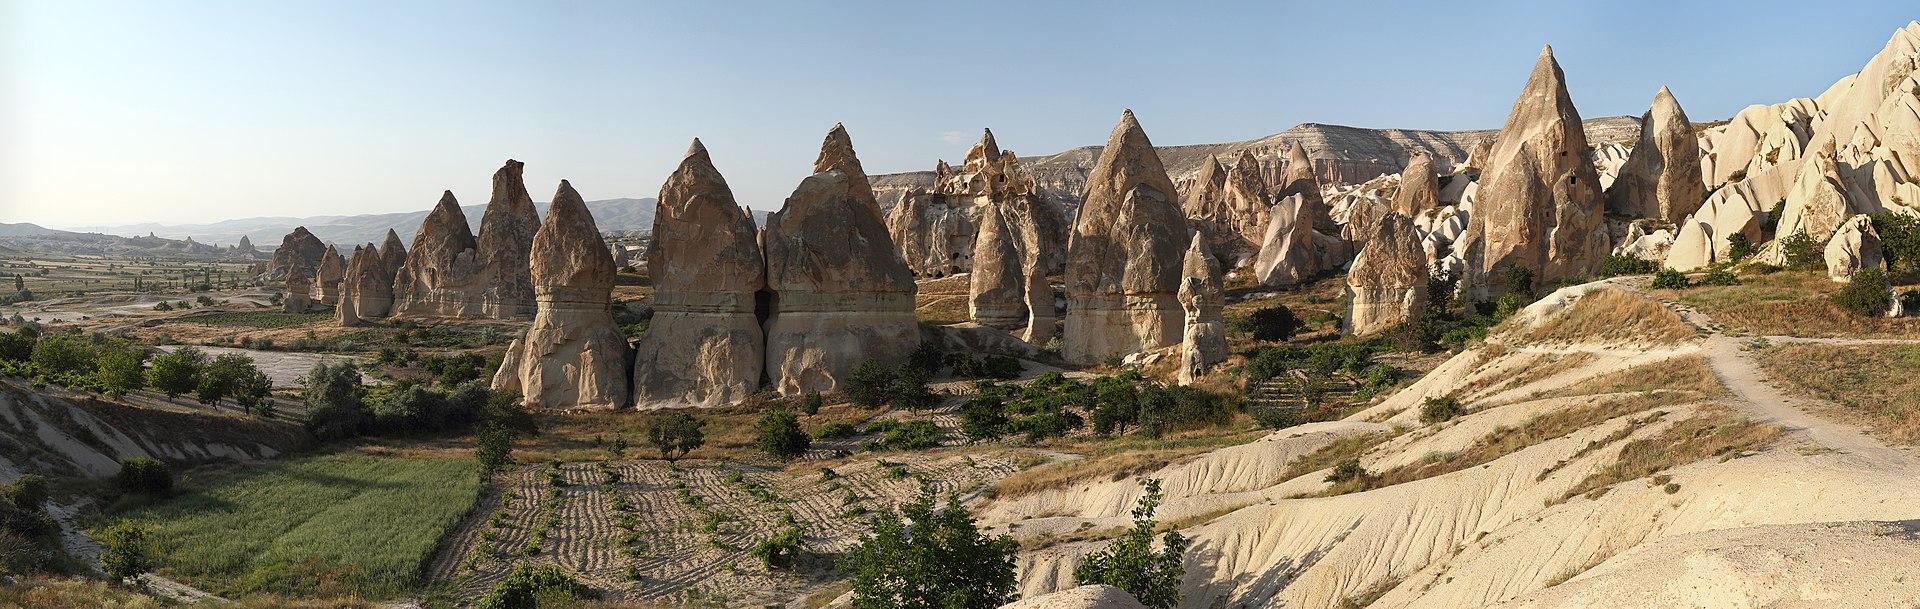 1920px-cappadocia_chimneys_-_dwiw